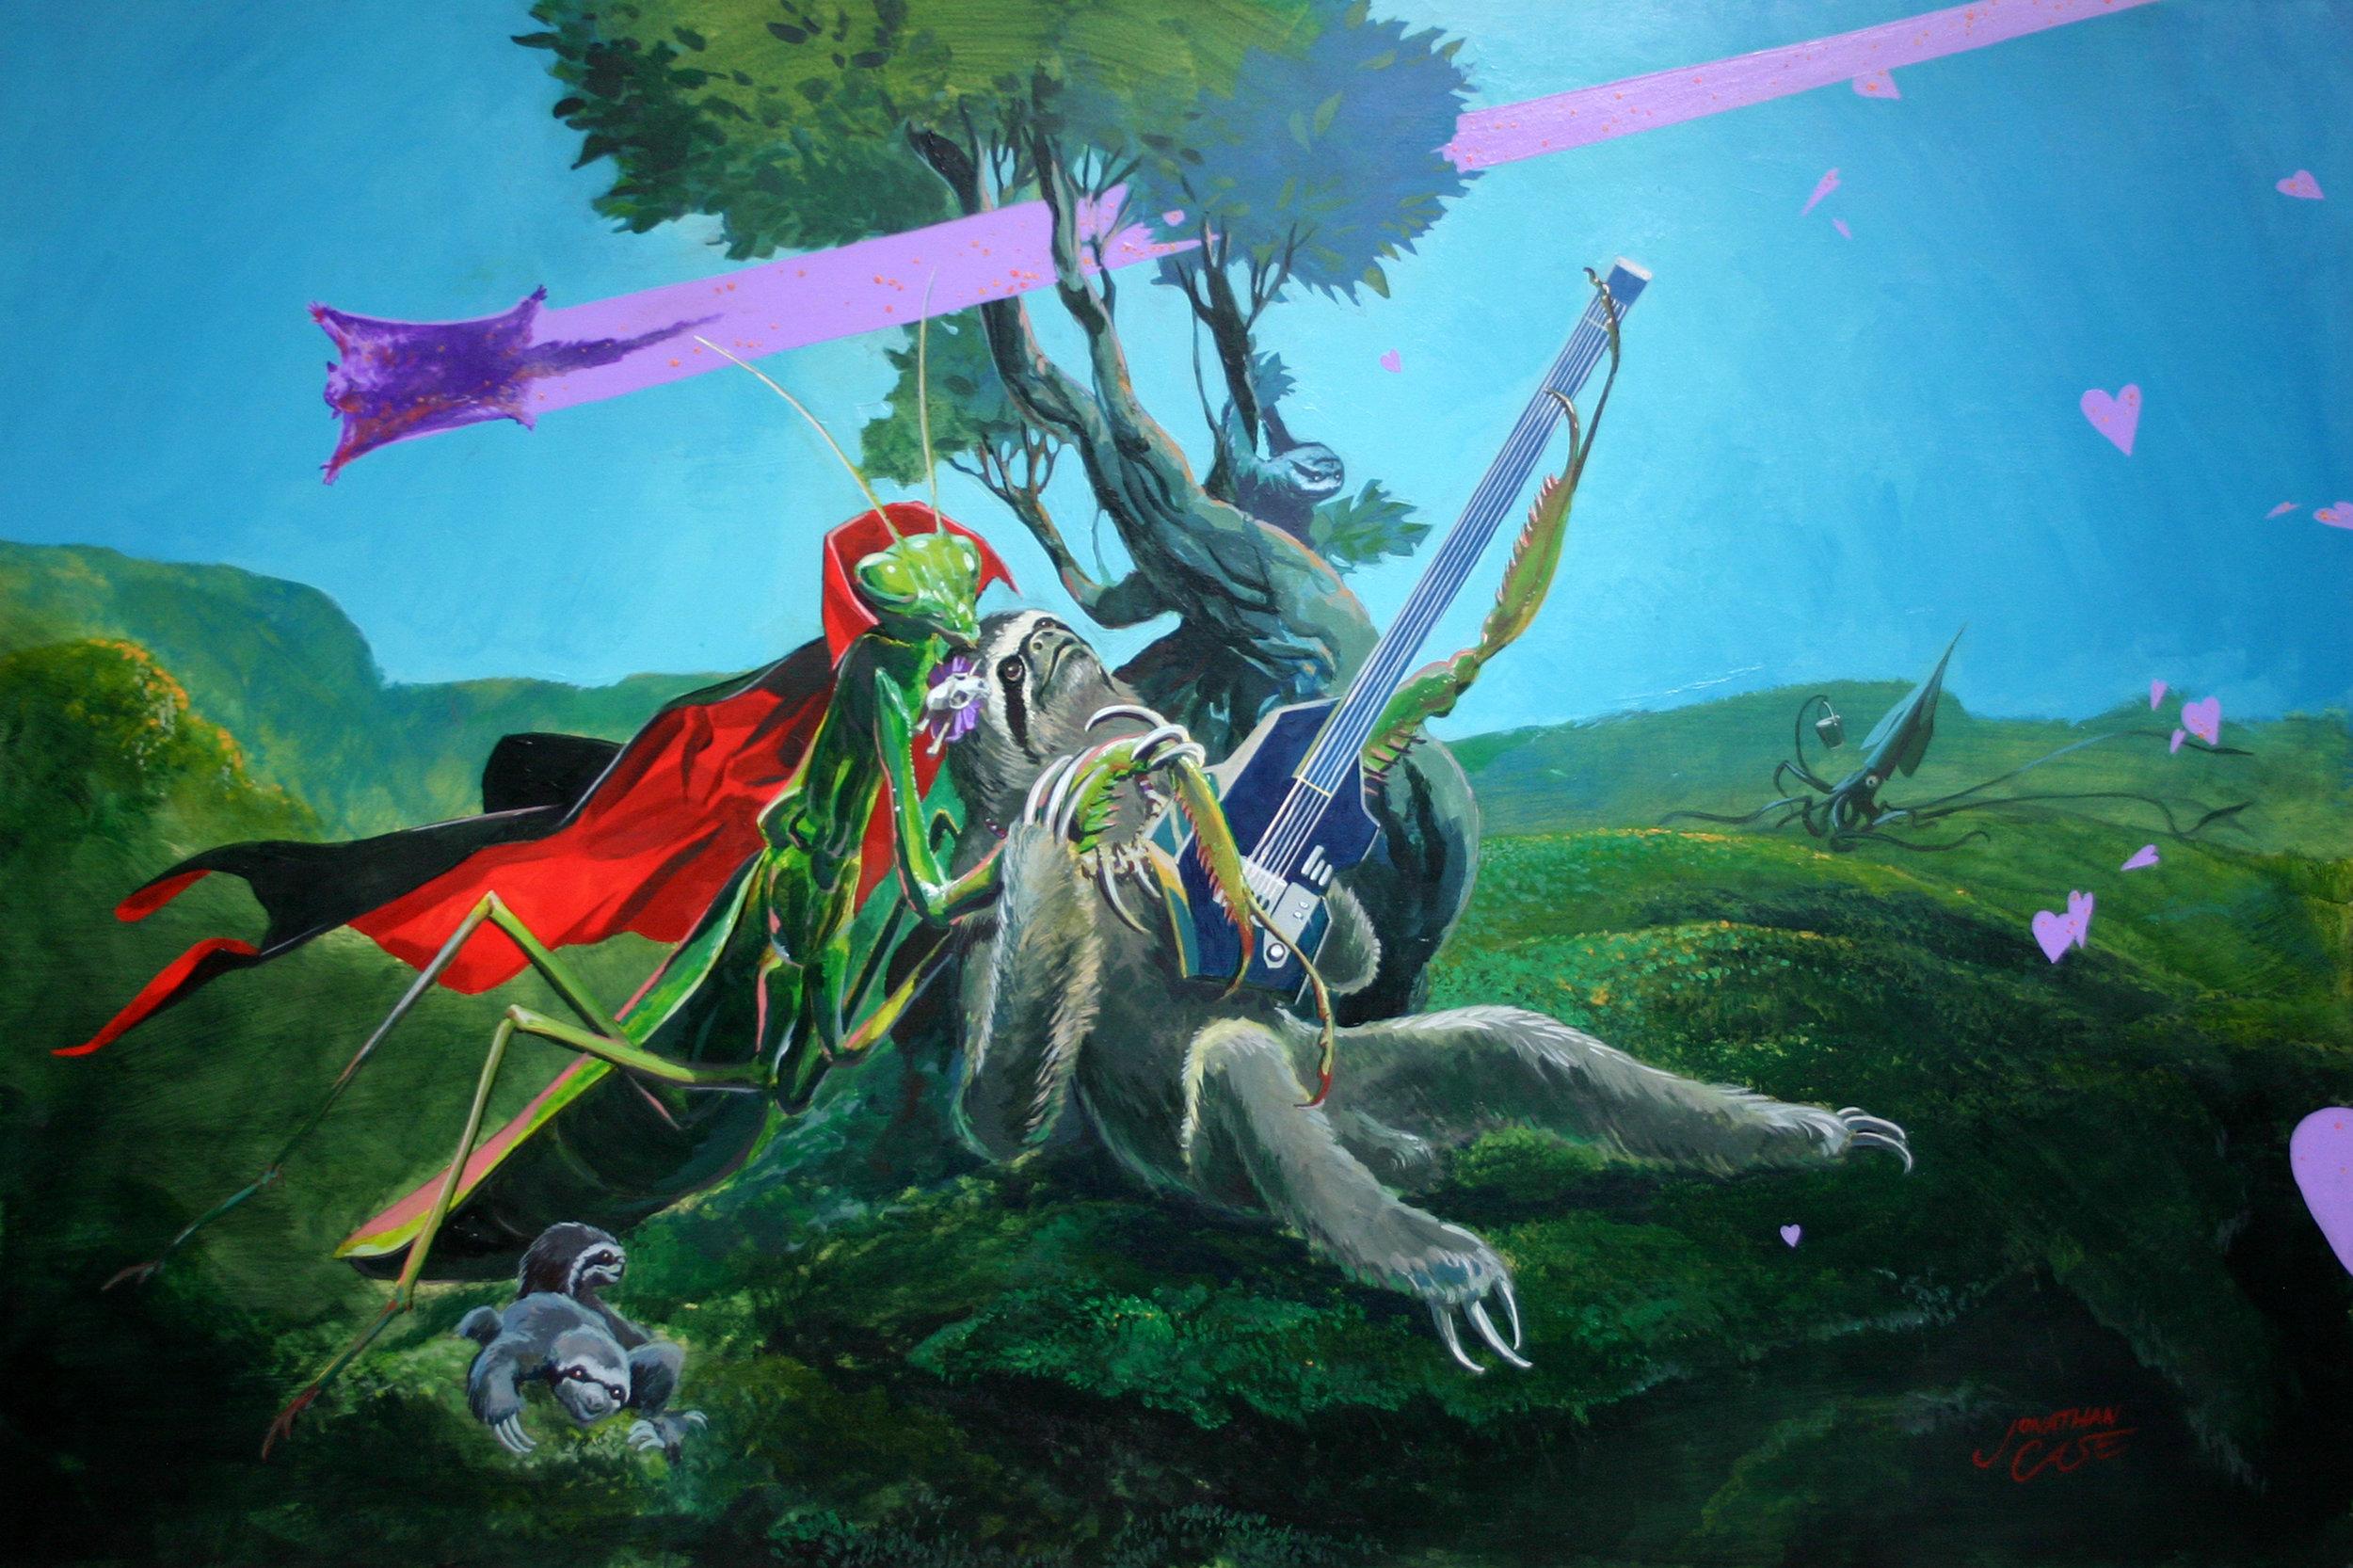 Sloth_Mantis_Love_Jonathan_Case.jpg